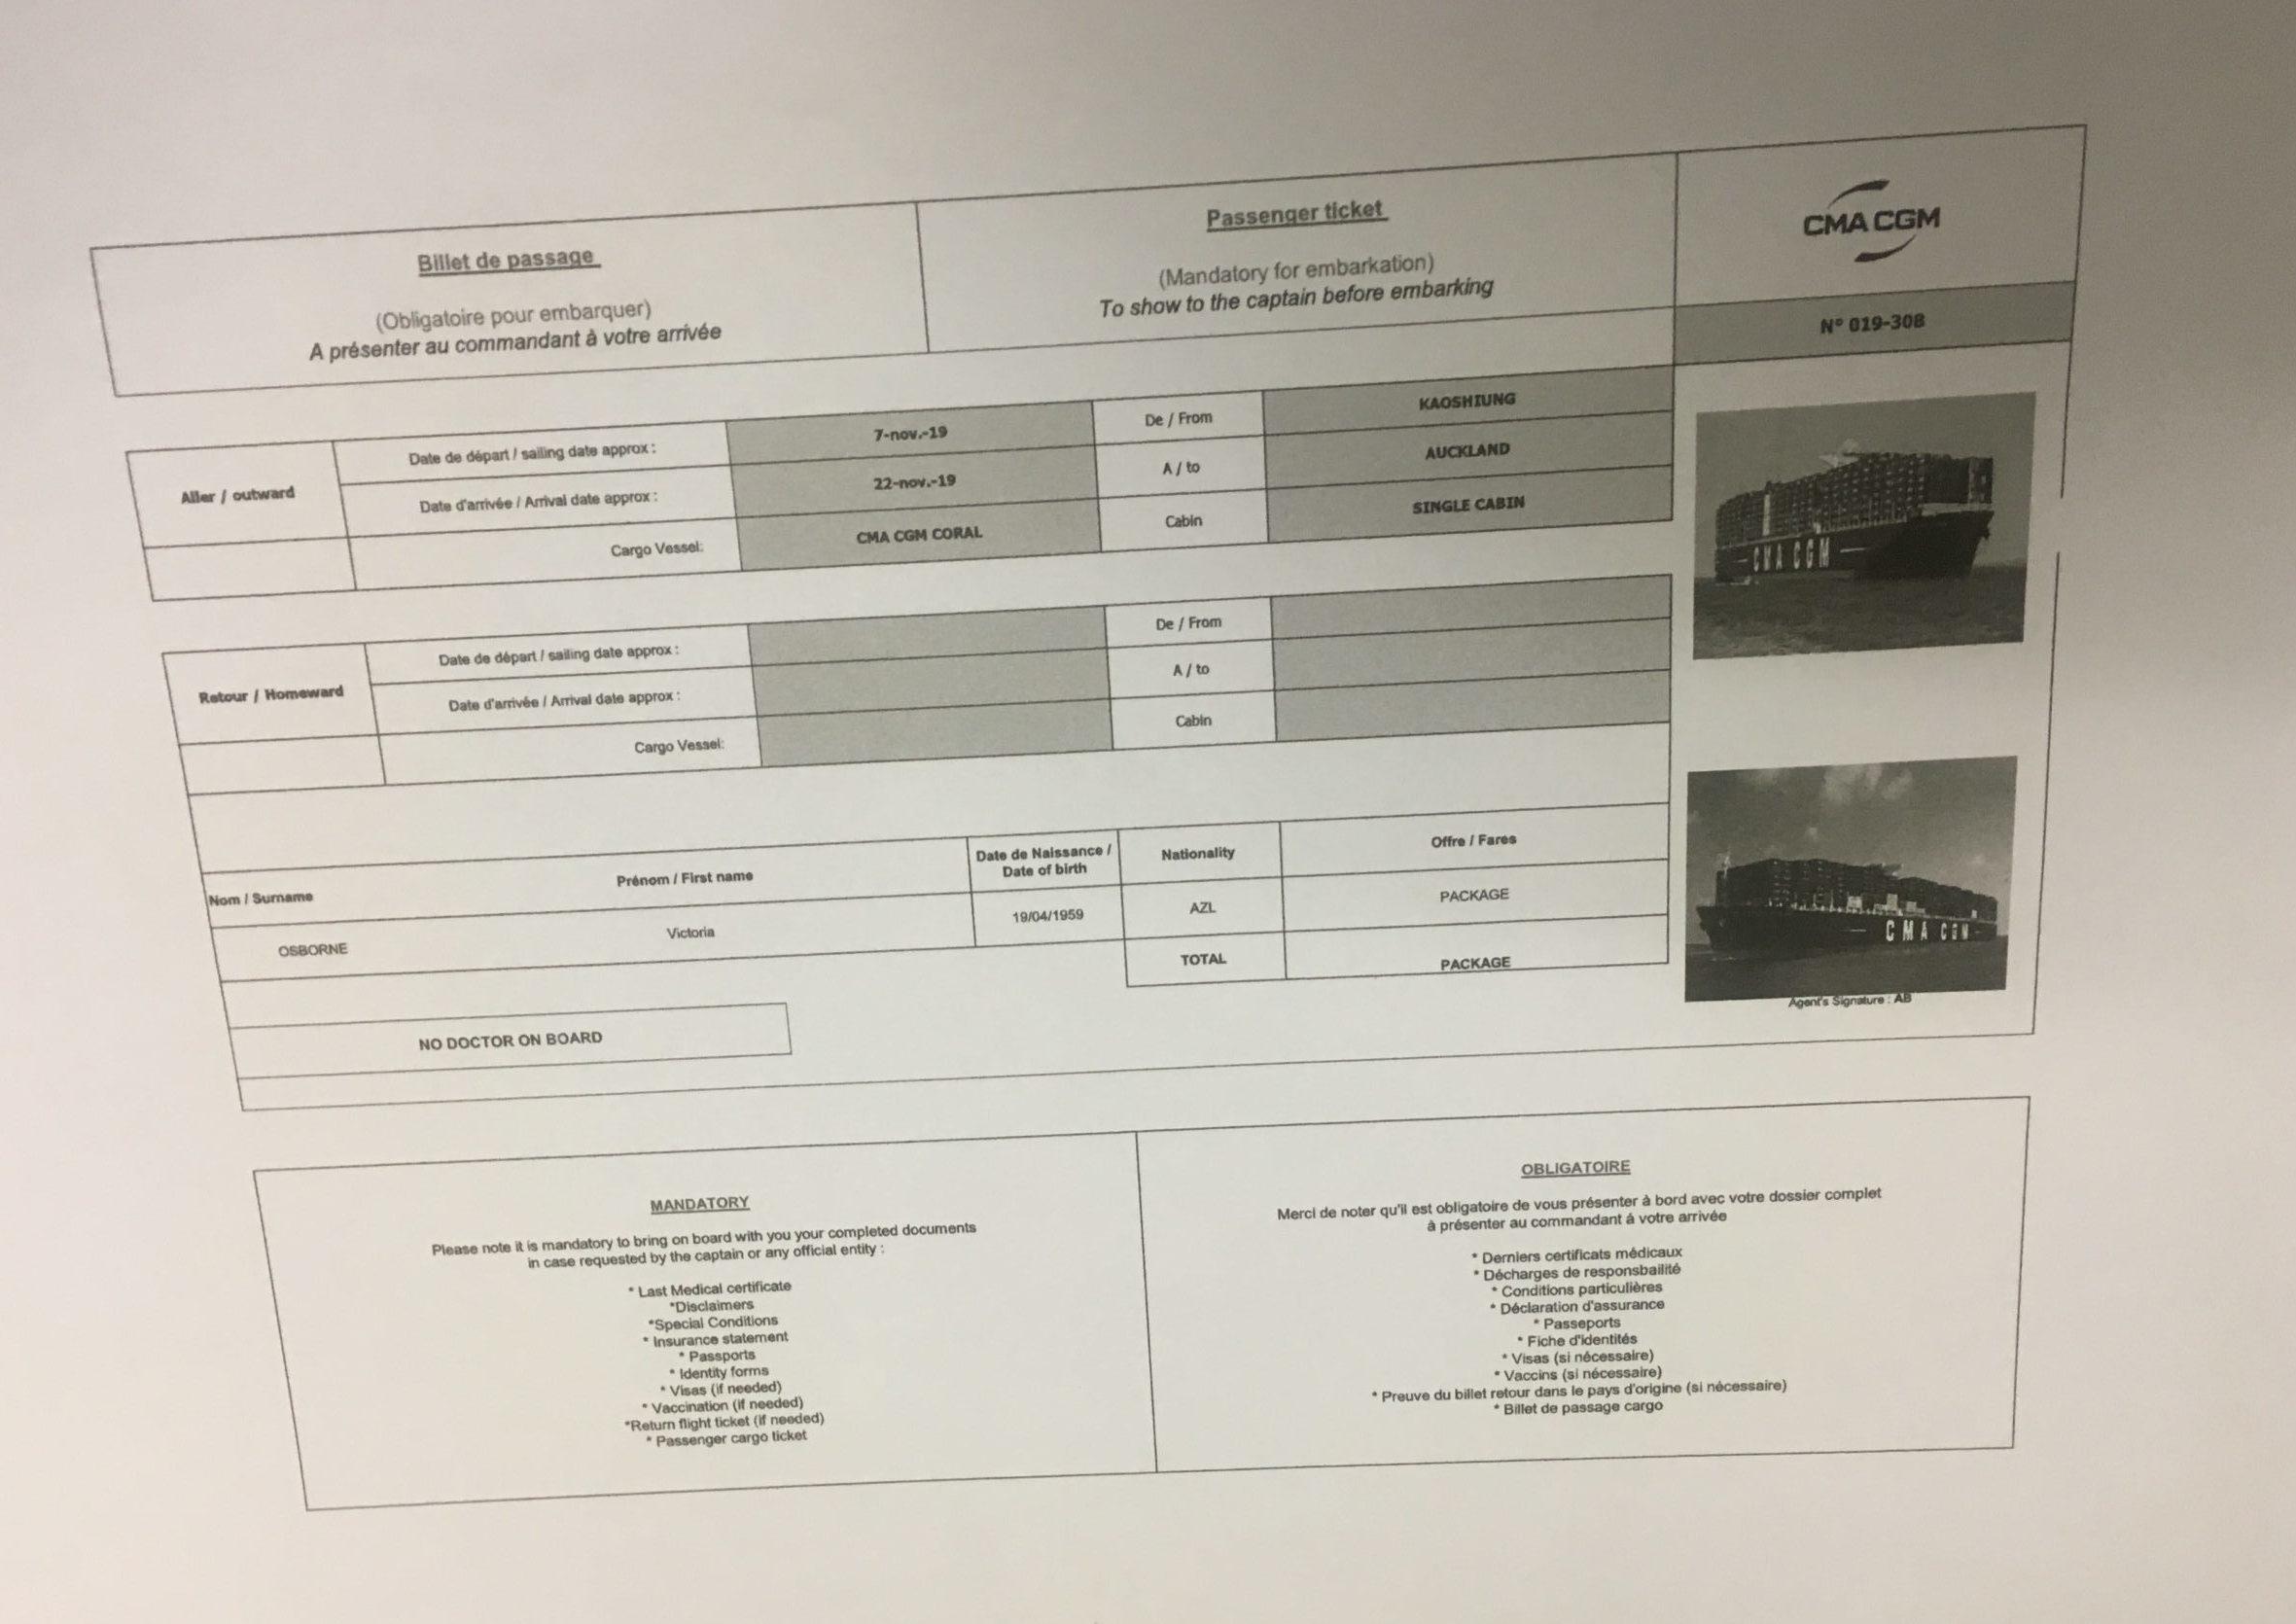 cargo cruise ticket